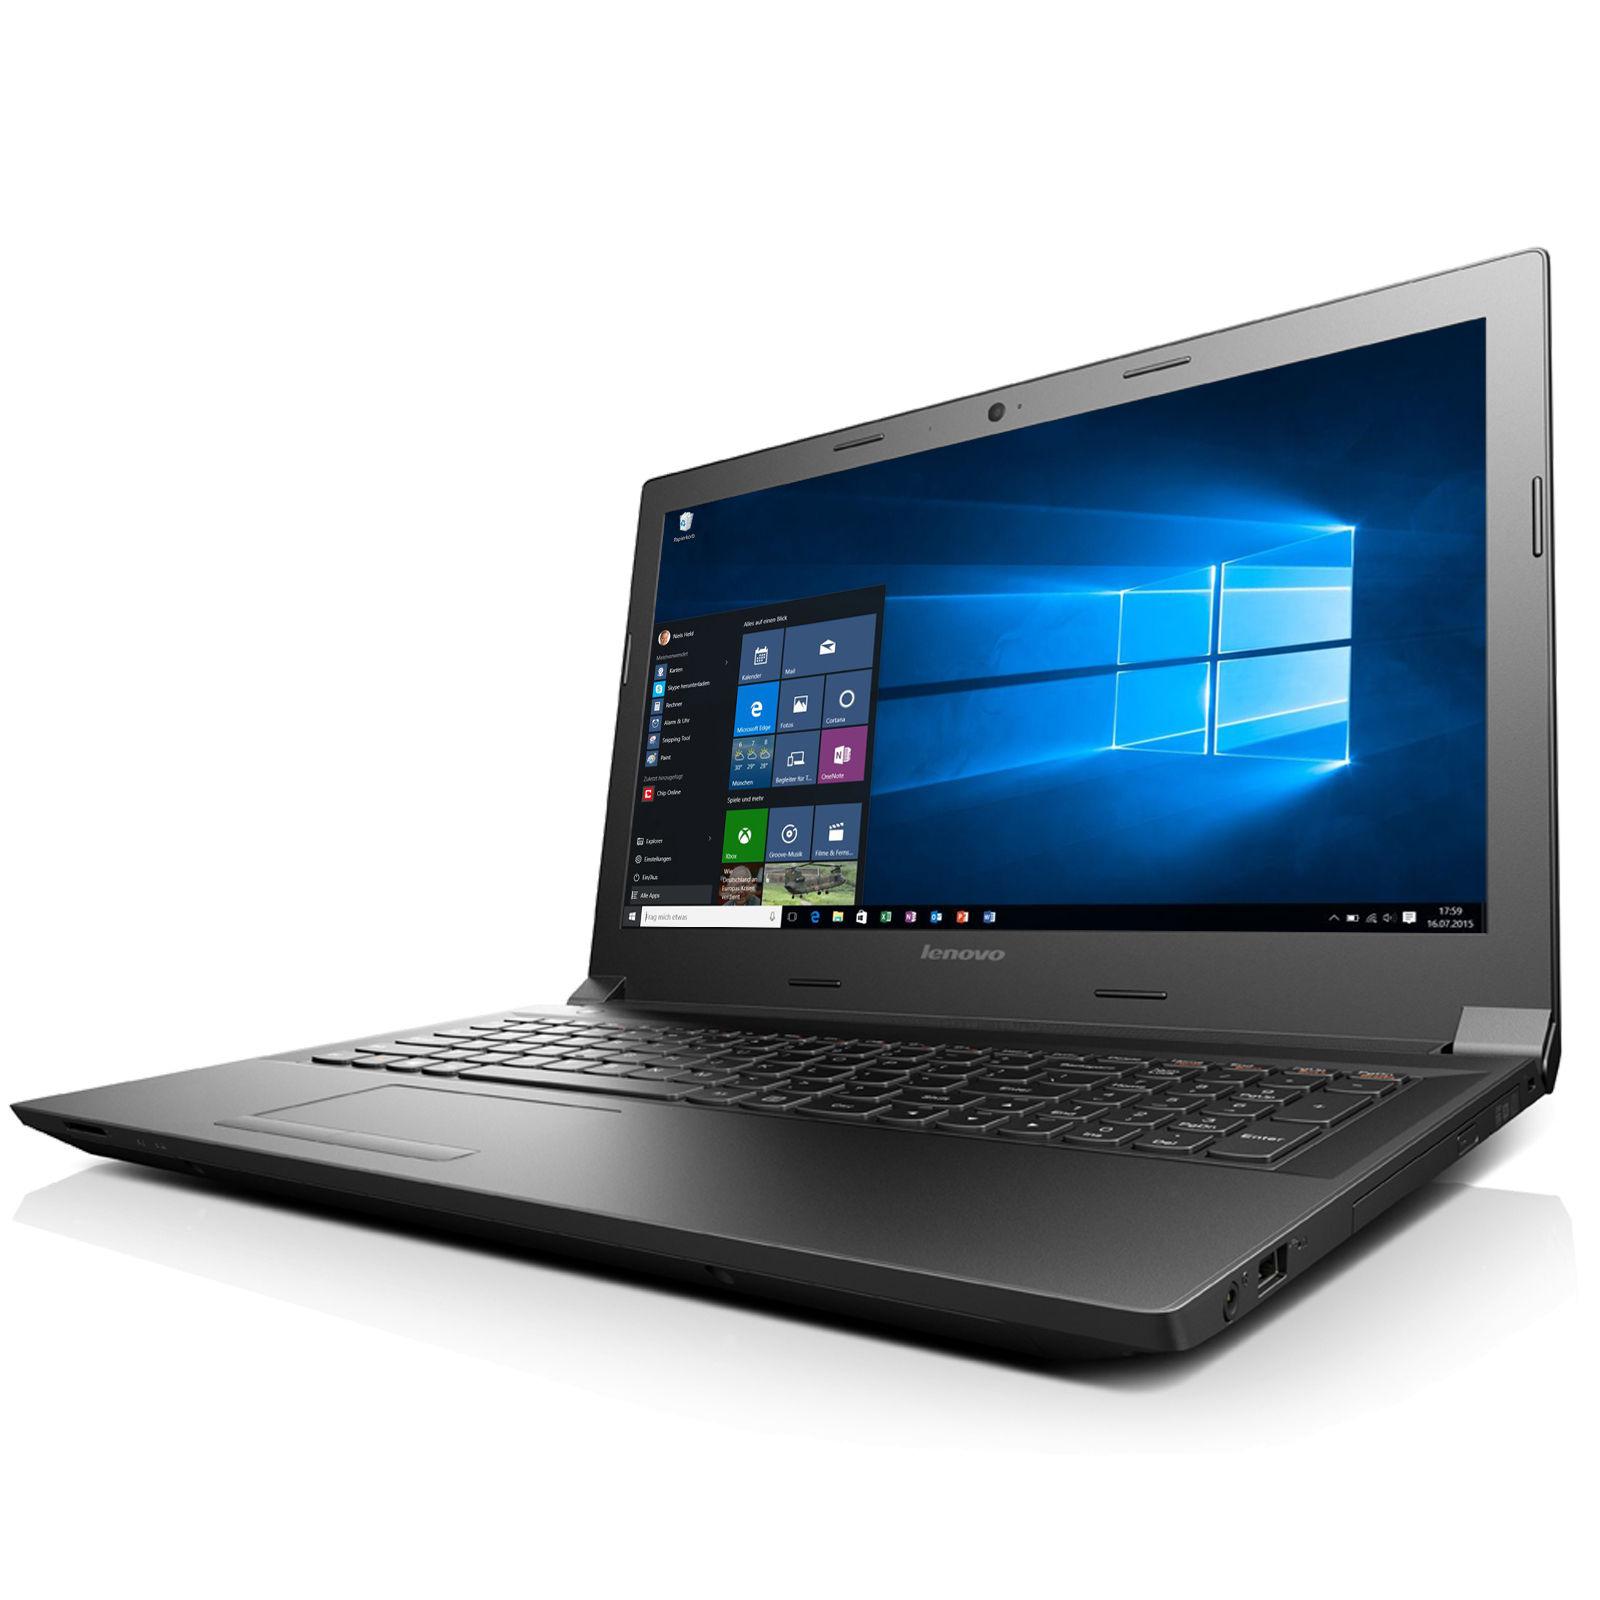 Lenovo Notebook 15,6 Zoll - Intel Core 2,58 GHz - 250 GB - HDMI - Windows 10 Pro